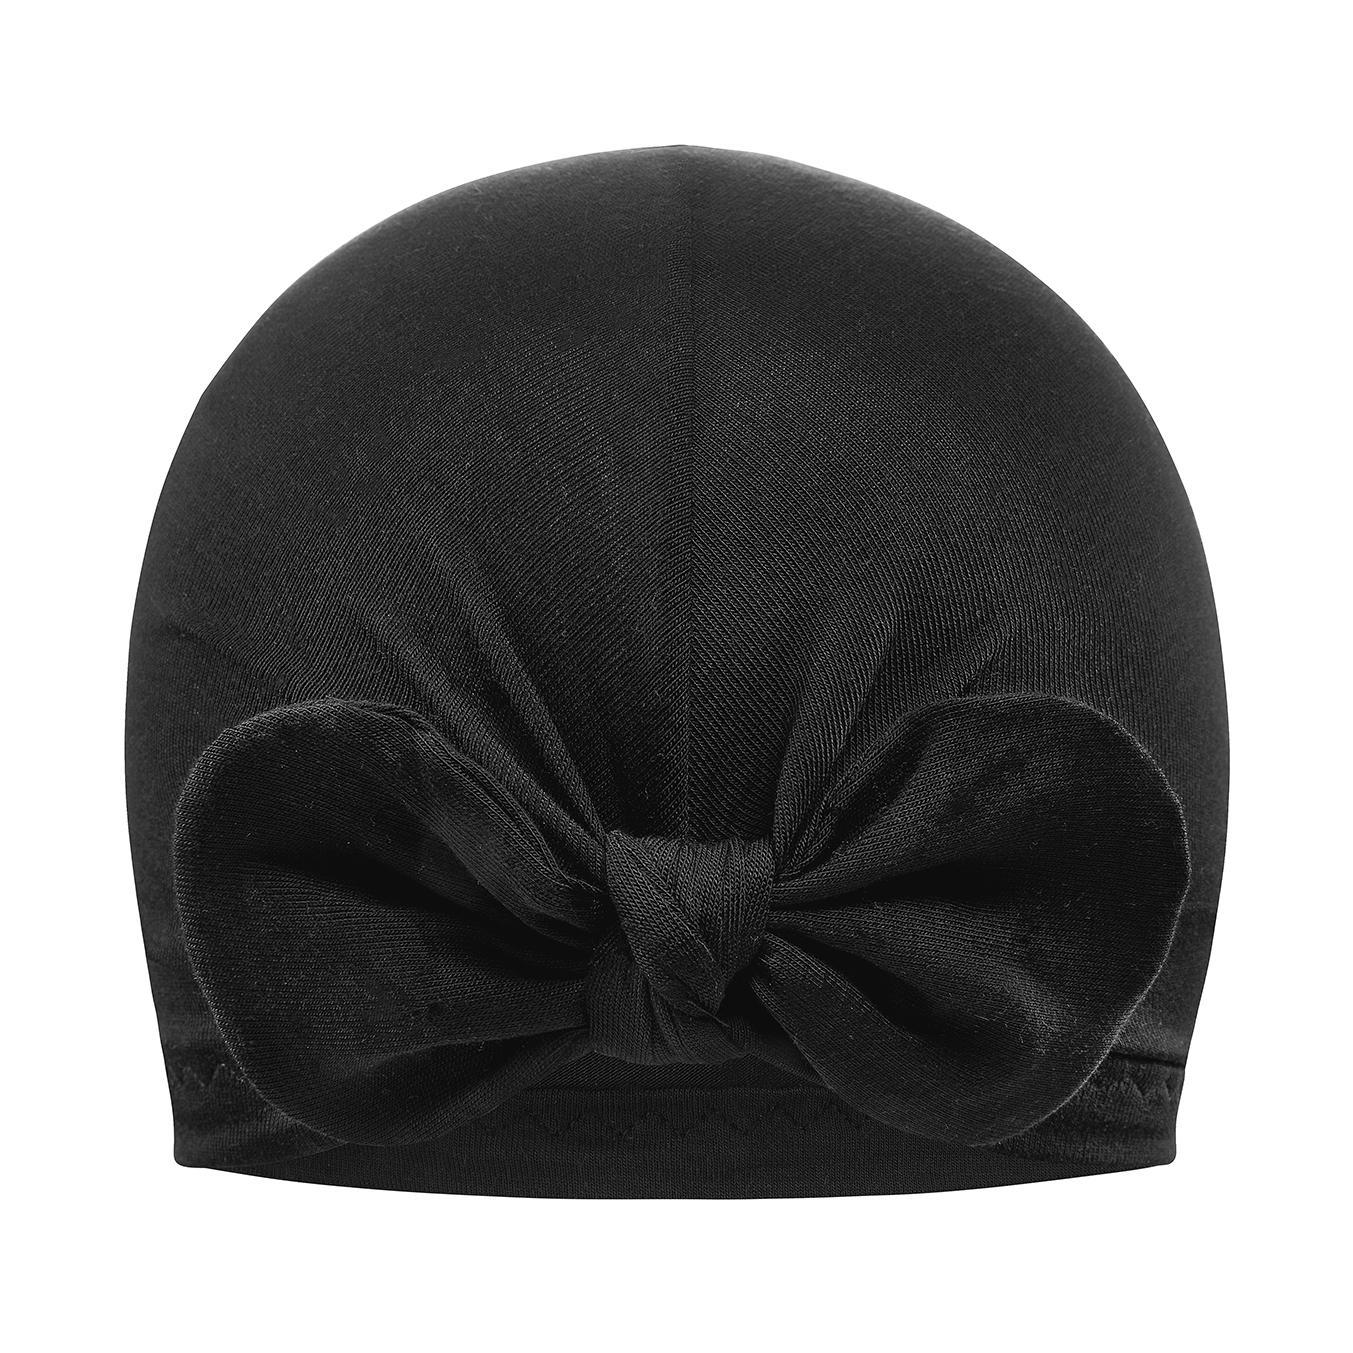 Dječji turban MAYLILY, black